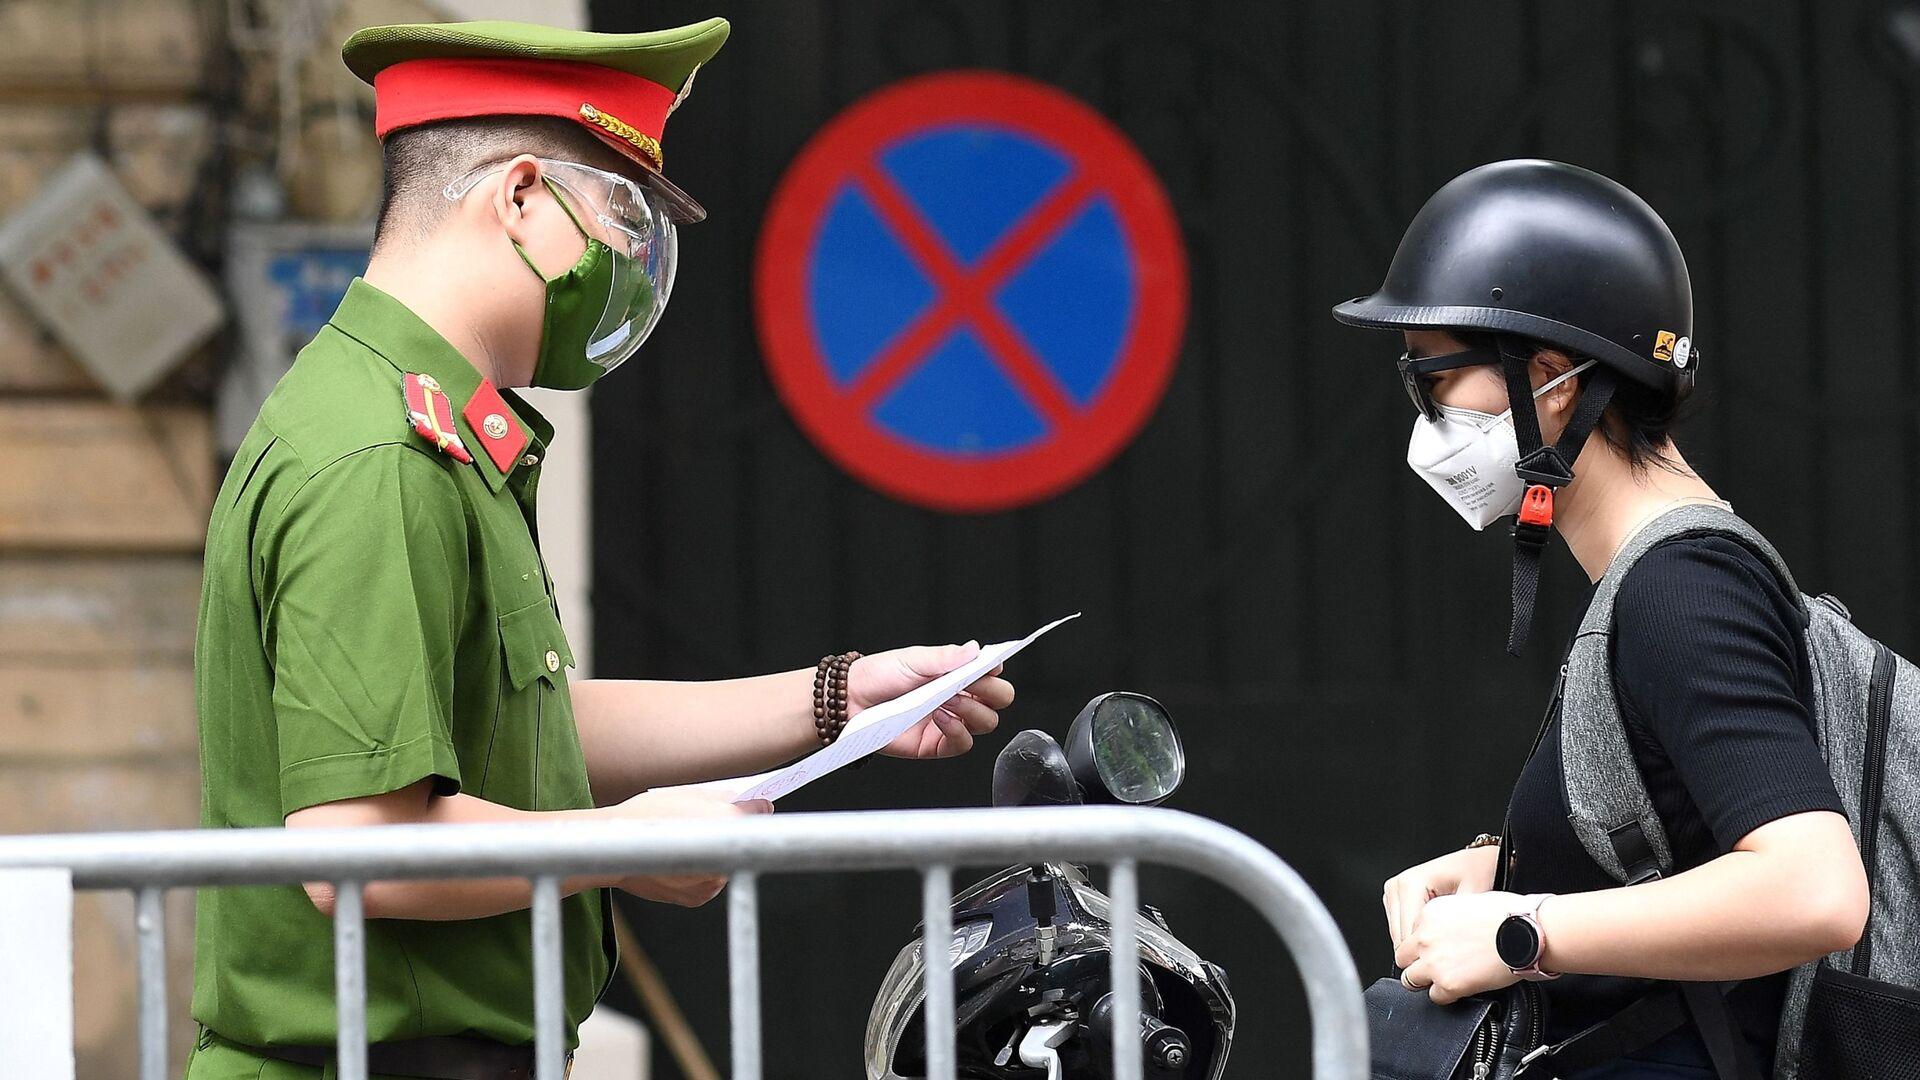 Cảnh sát kiểm tra giấy tờ - Sputnik Việt Nam, 1920, 23.09.2021